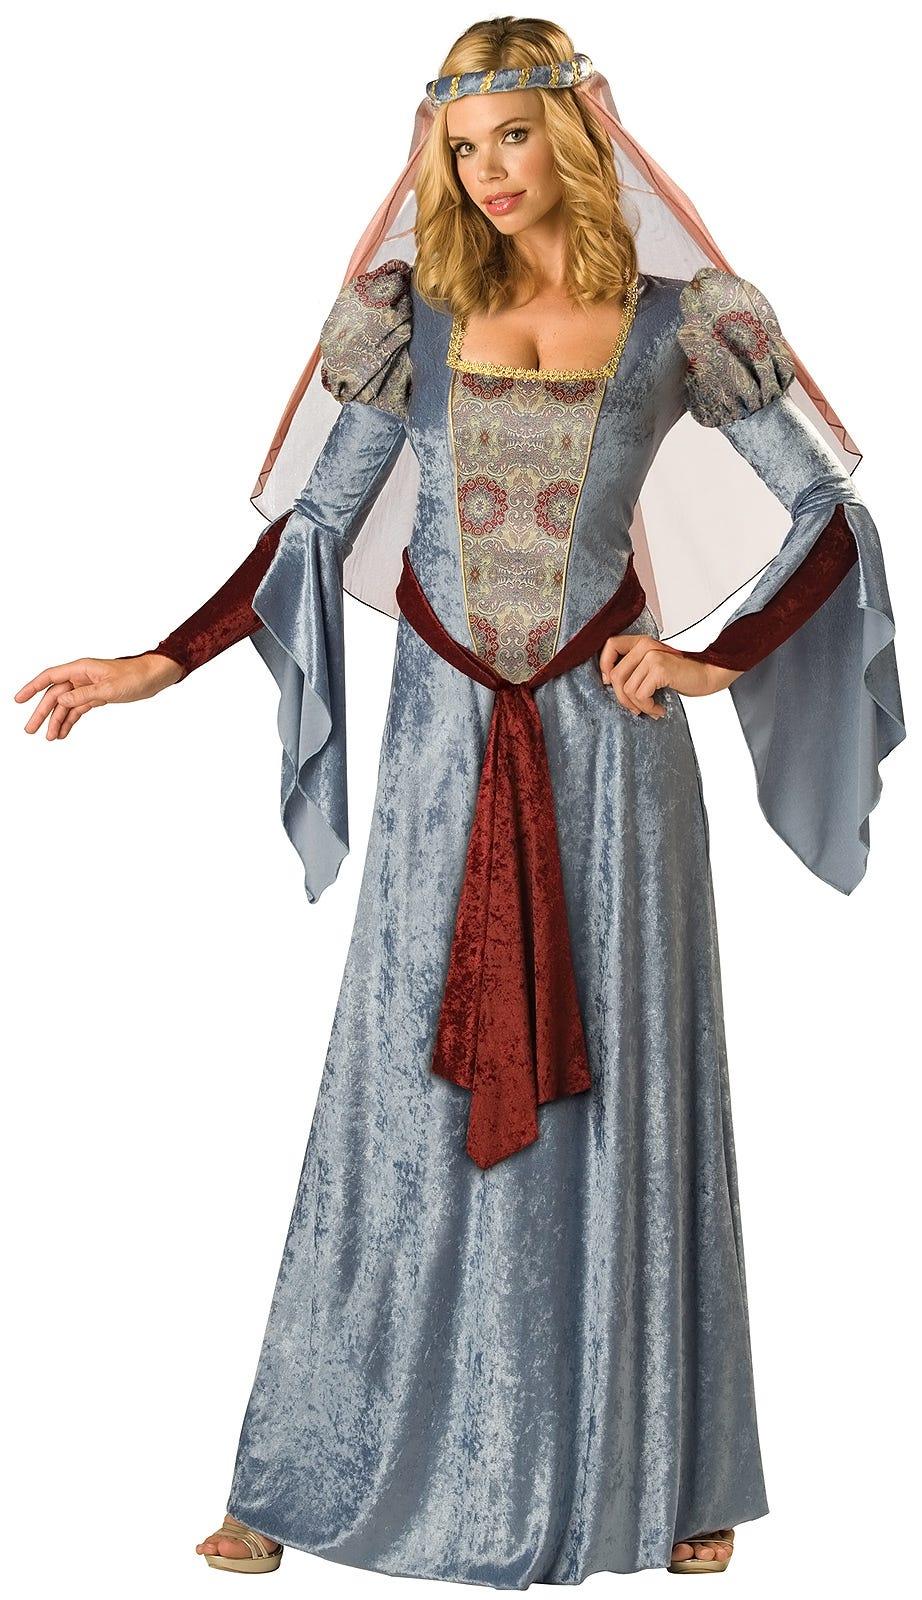 015ca36cfd6e Robin Hood Maid Marian Adult Women Renaissance Medieval Costume Fancy Dress  Up